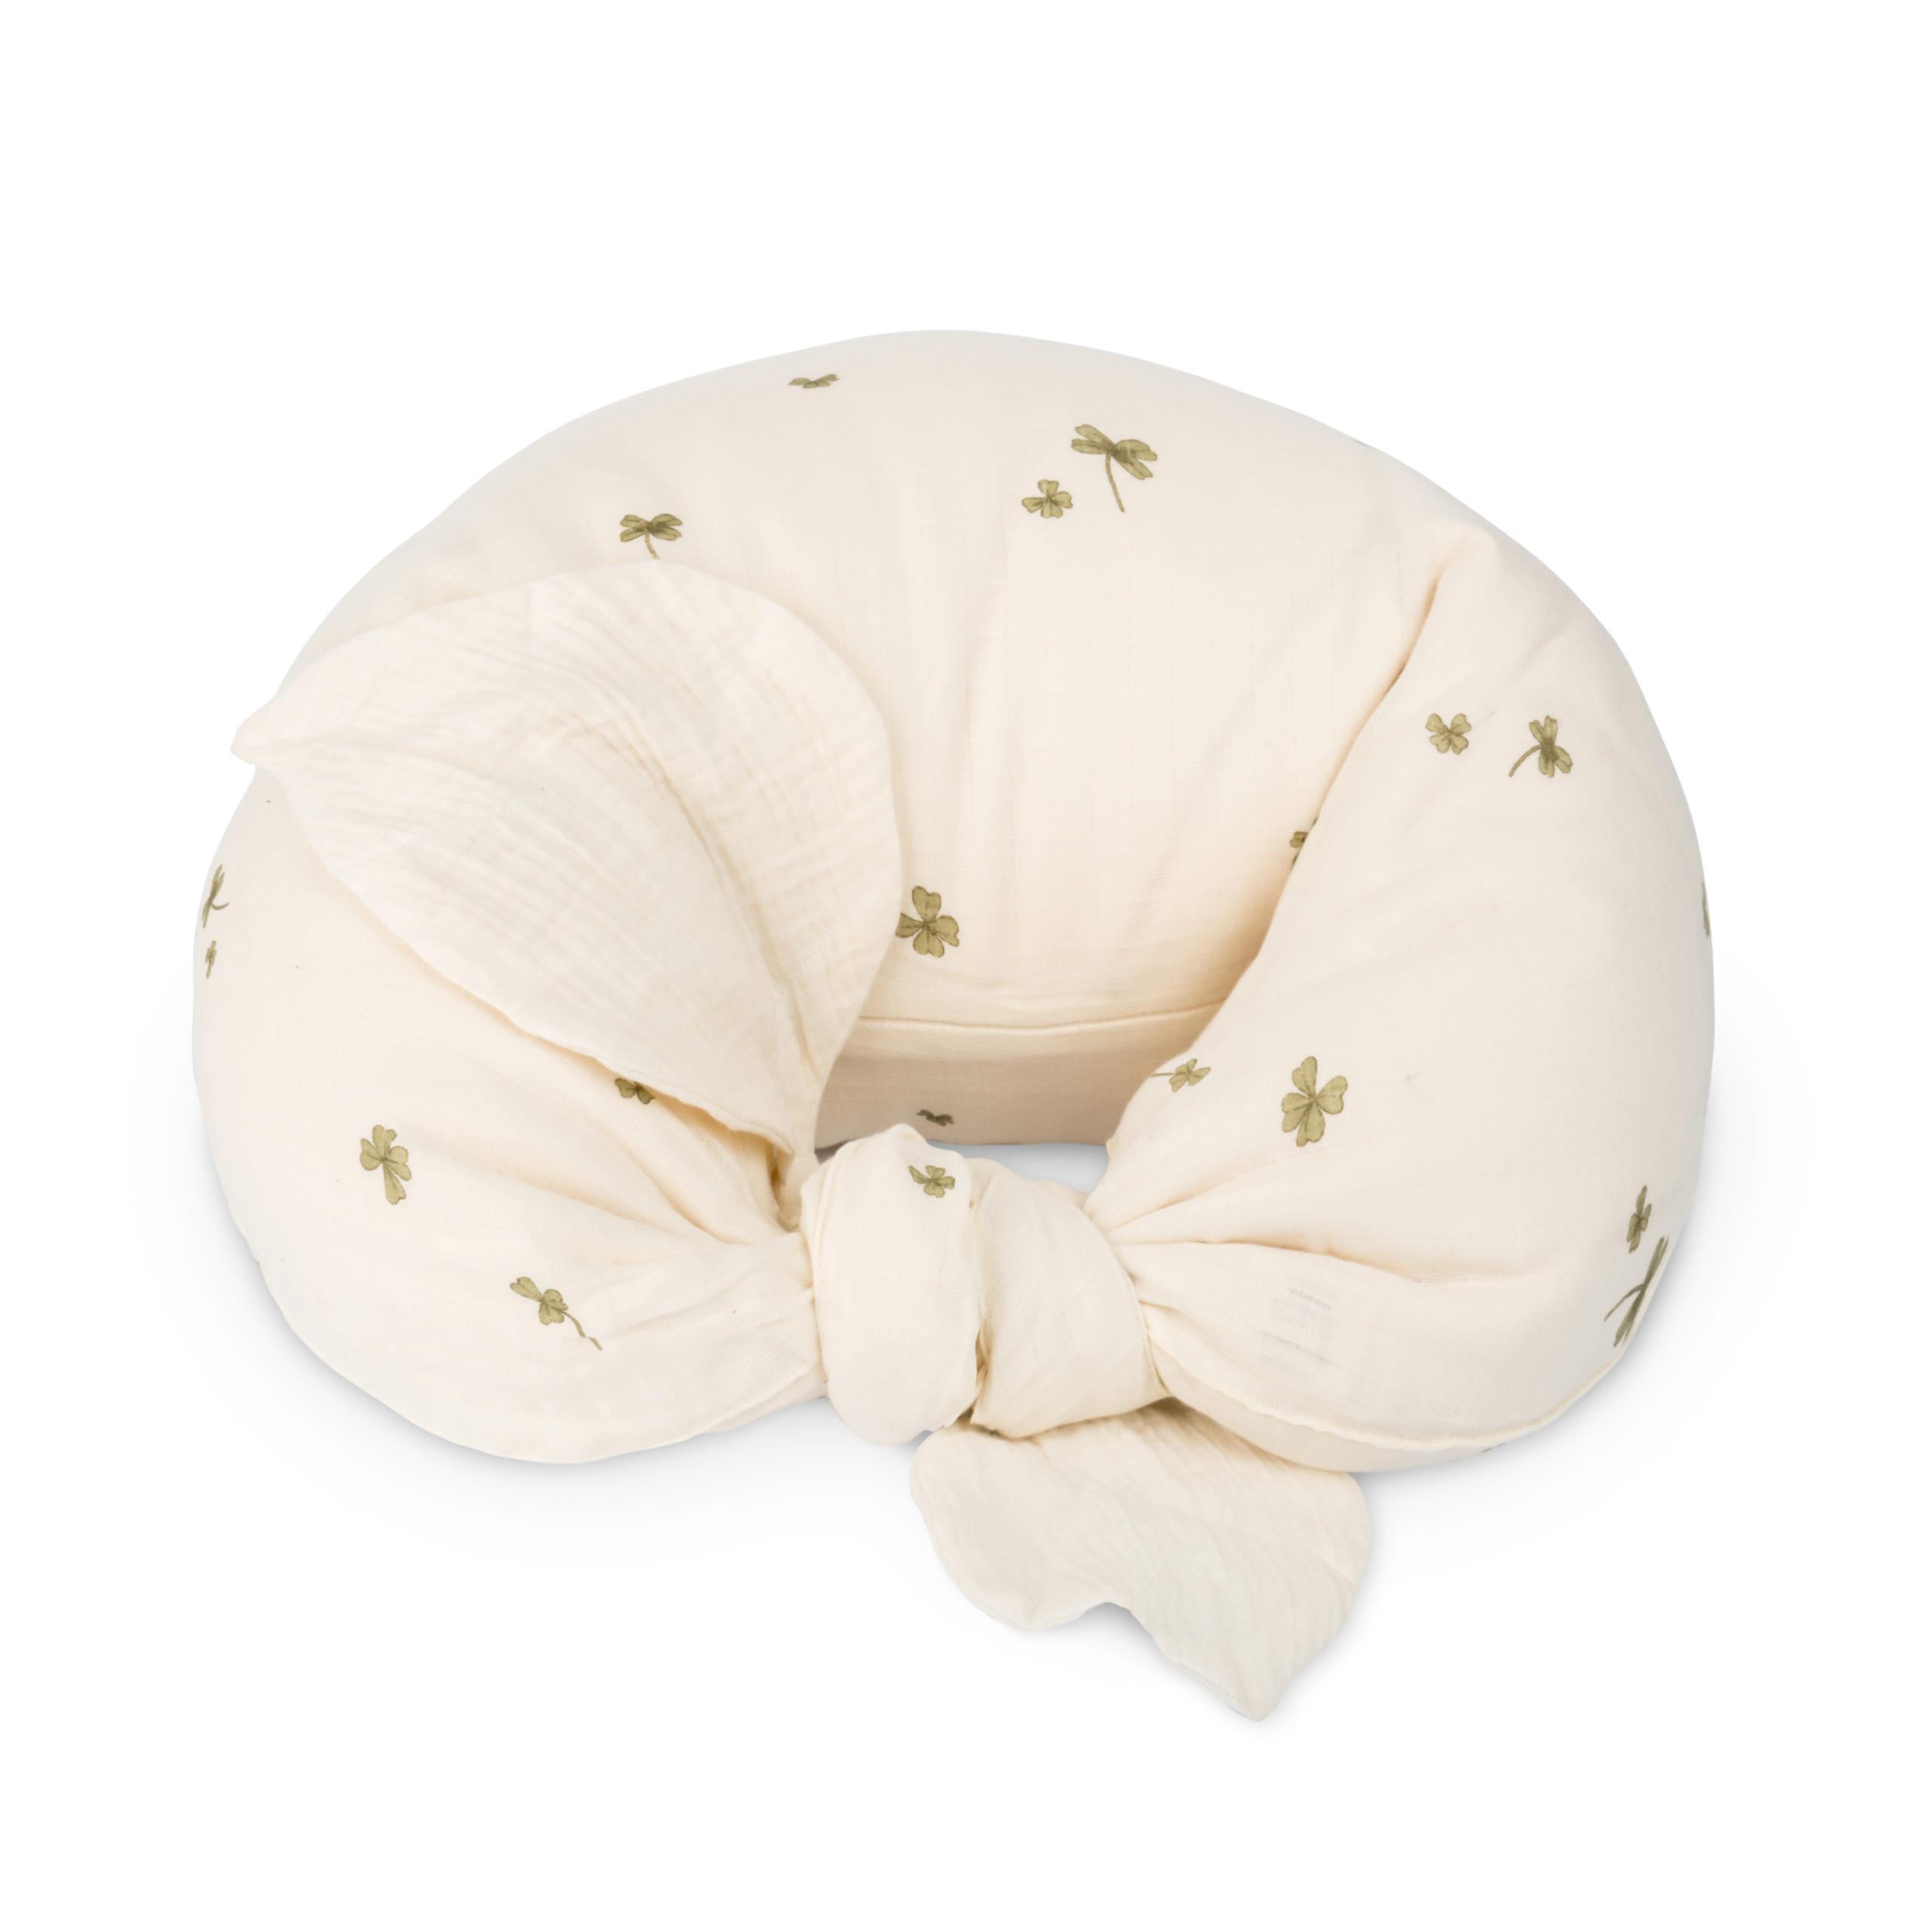 That's Mine - Nursing Pillow Cover - Clover Meadow (NPC80)